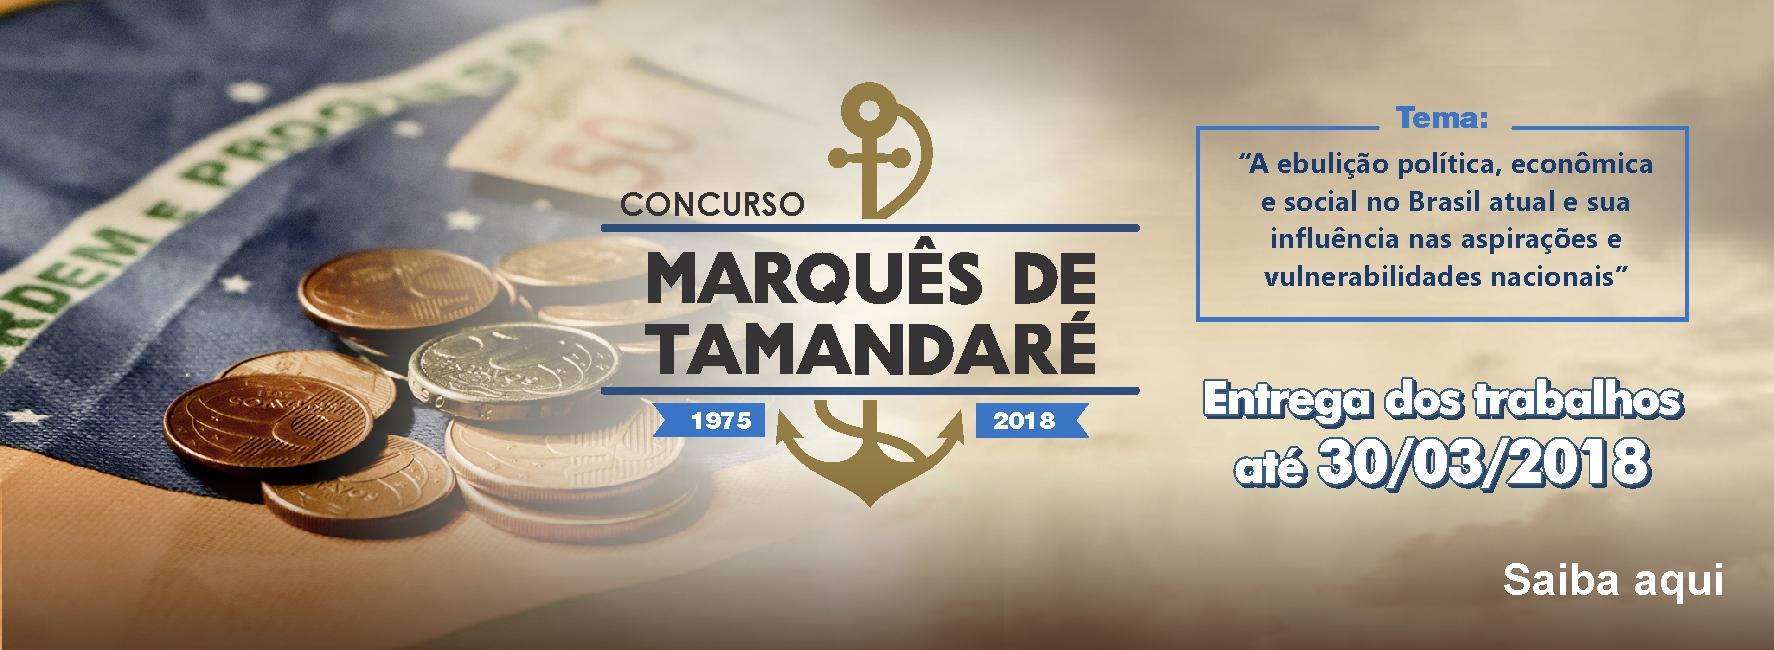 https://www.clubenaval.org.br/novo/concurso-marqu%C3%AAs-de-tamandar%C3%A9-2018